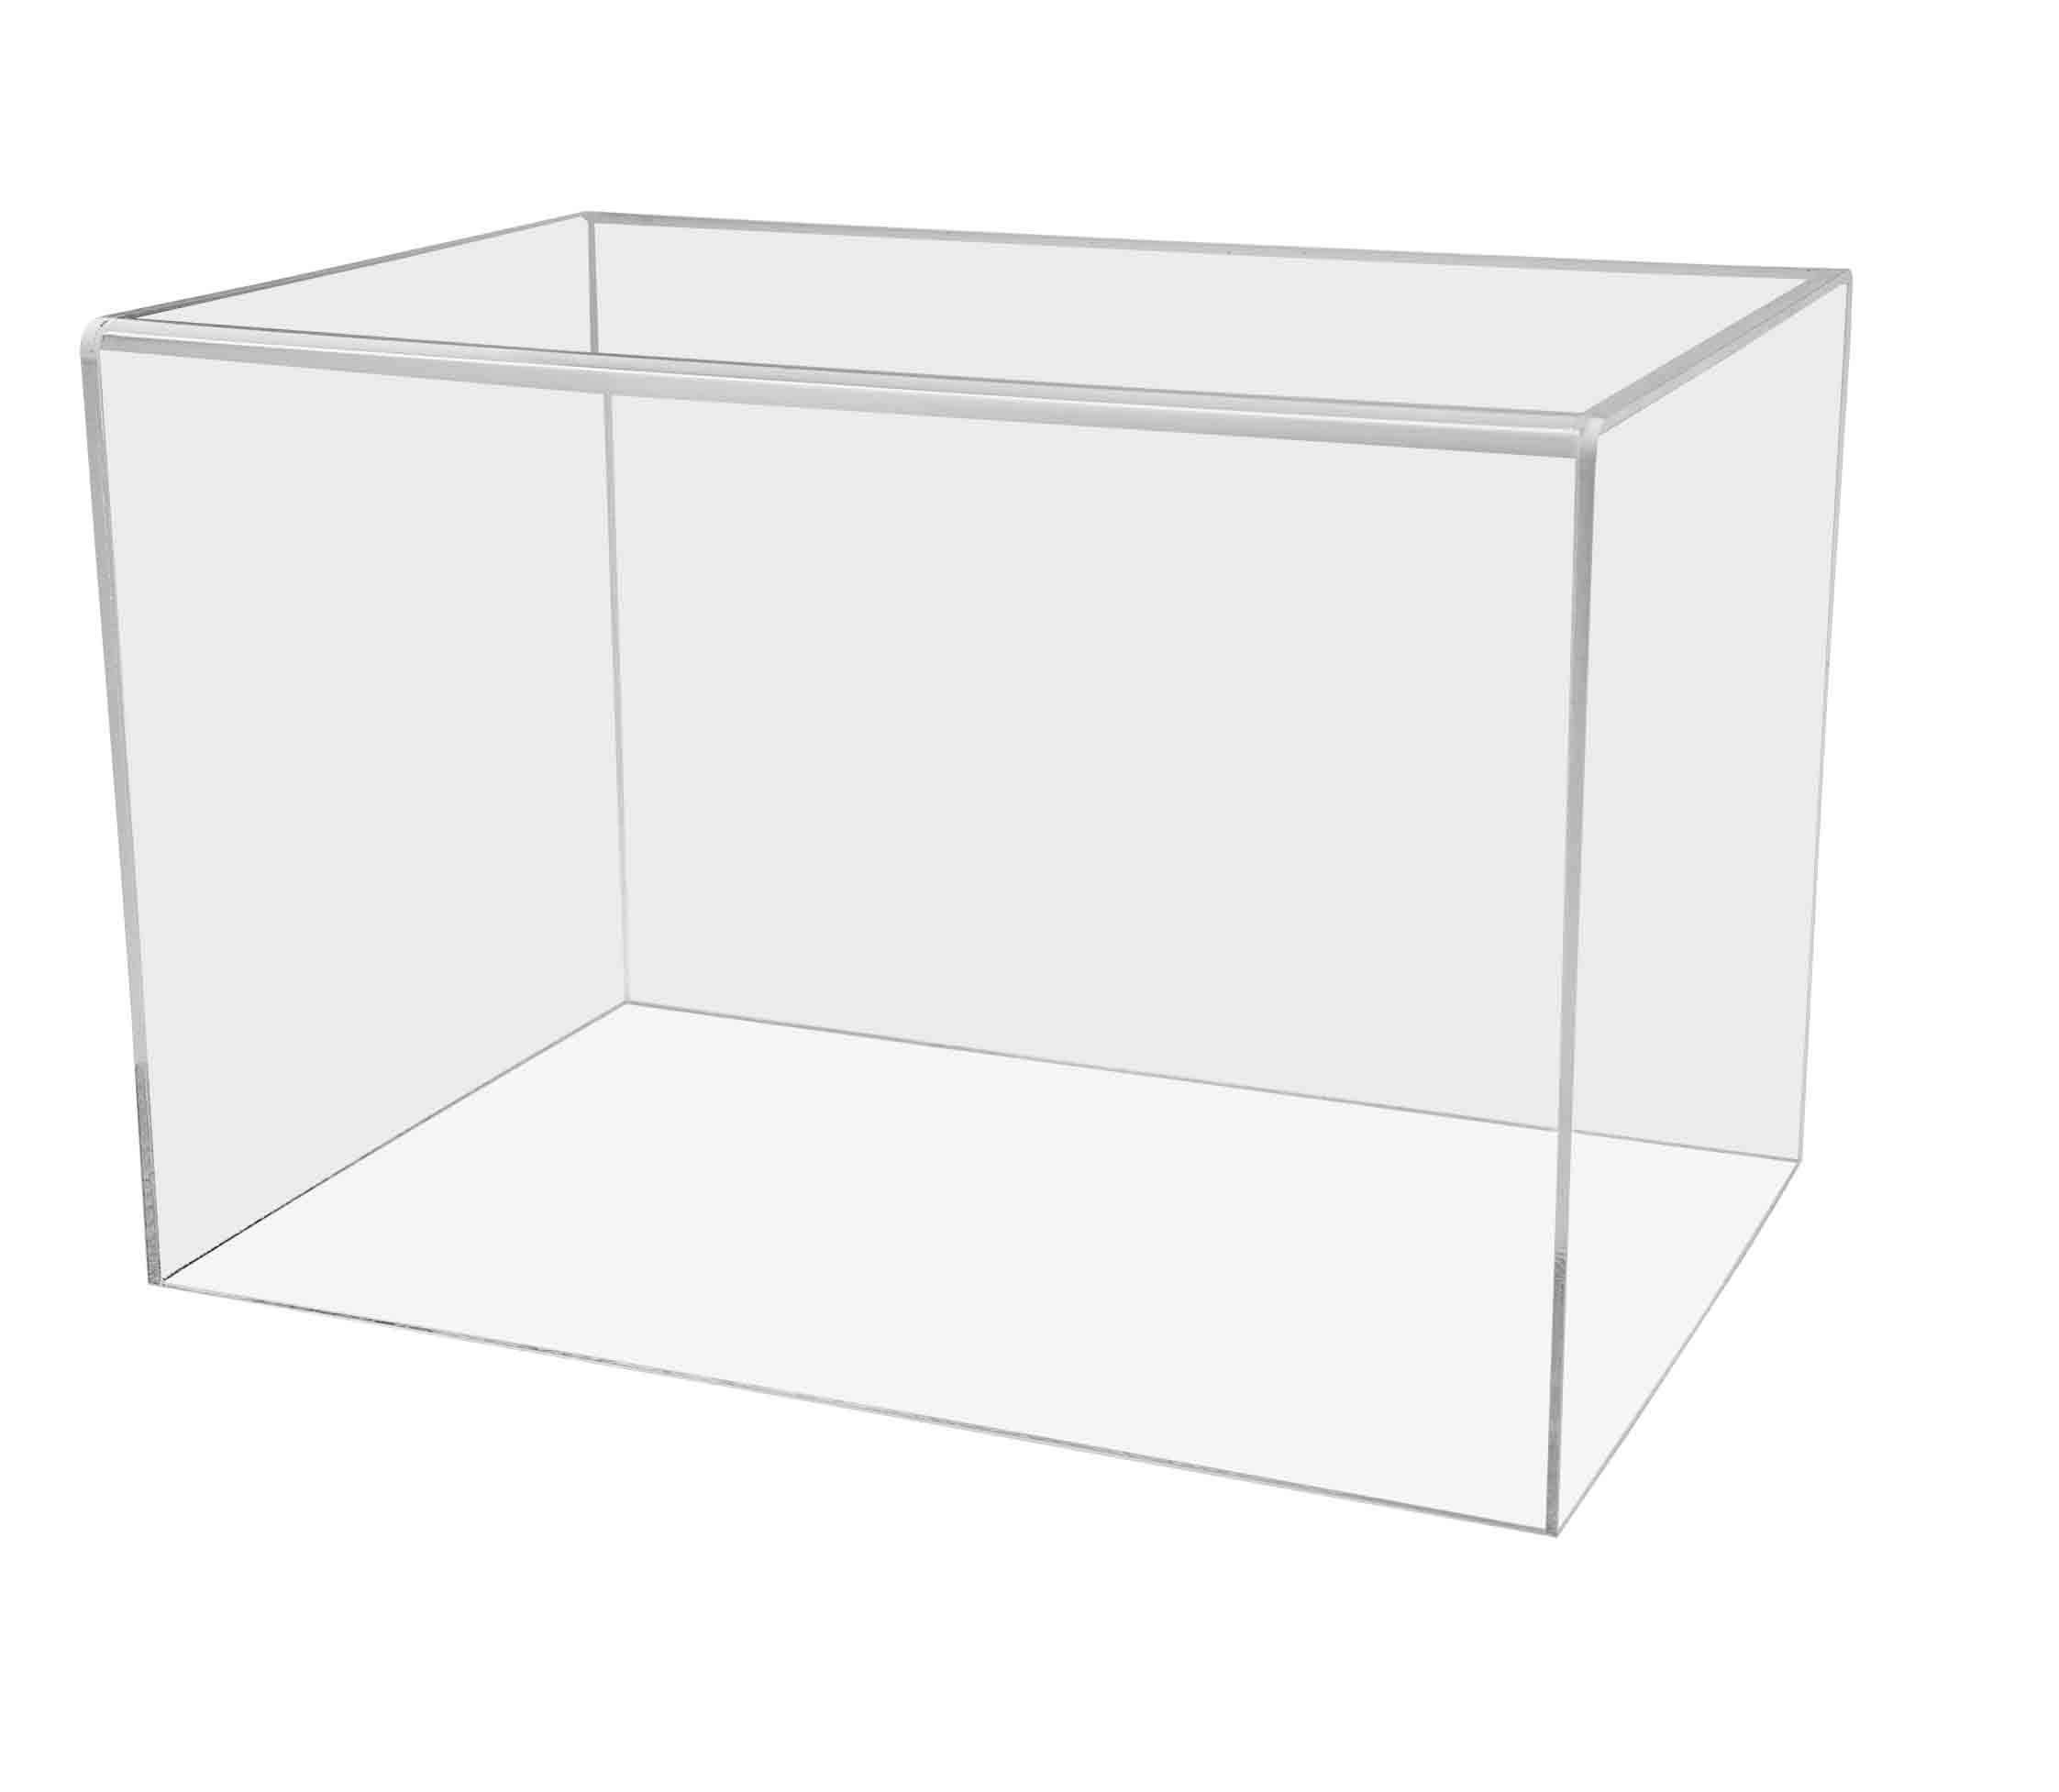 Marketing Holders 5 Sided Cube Display Pedestal Stand 8'' x 12'' x 8'' Acrylic Box Clear Showcase Trophy Figurine Art Statue